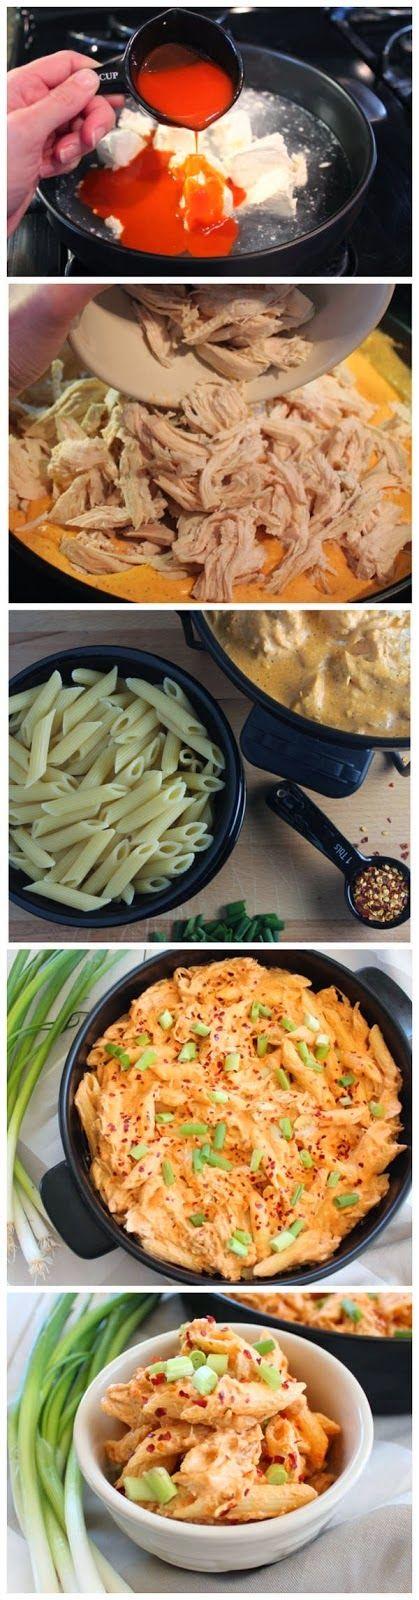 Buffalo Chicken Cheesy Penne Pasta Recipe